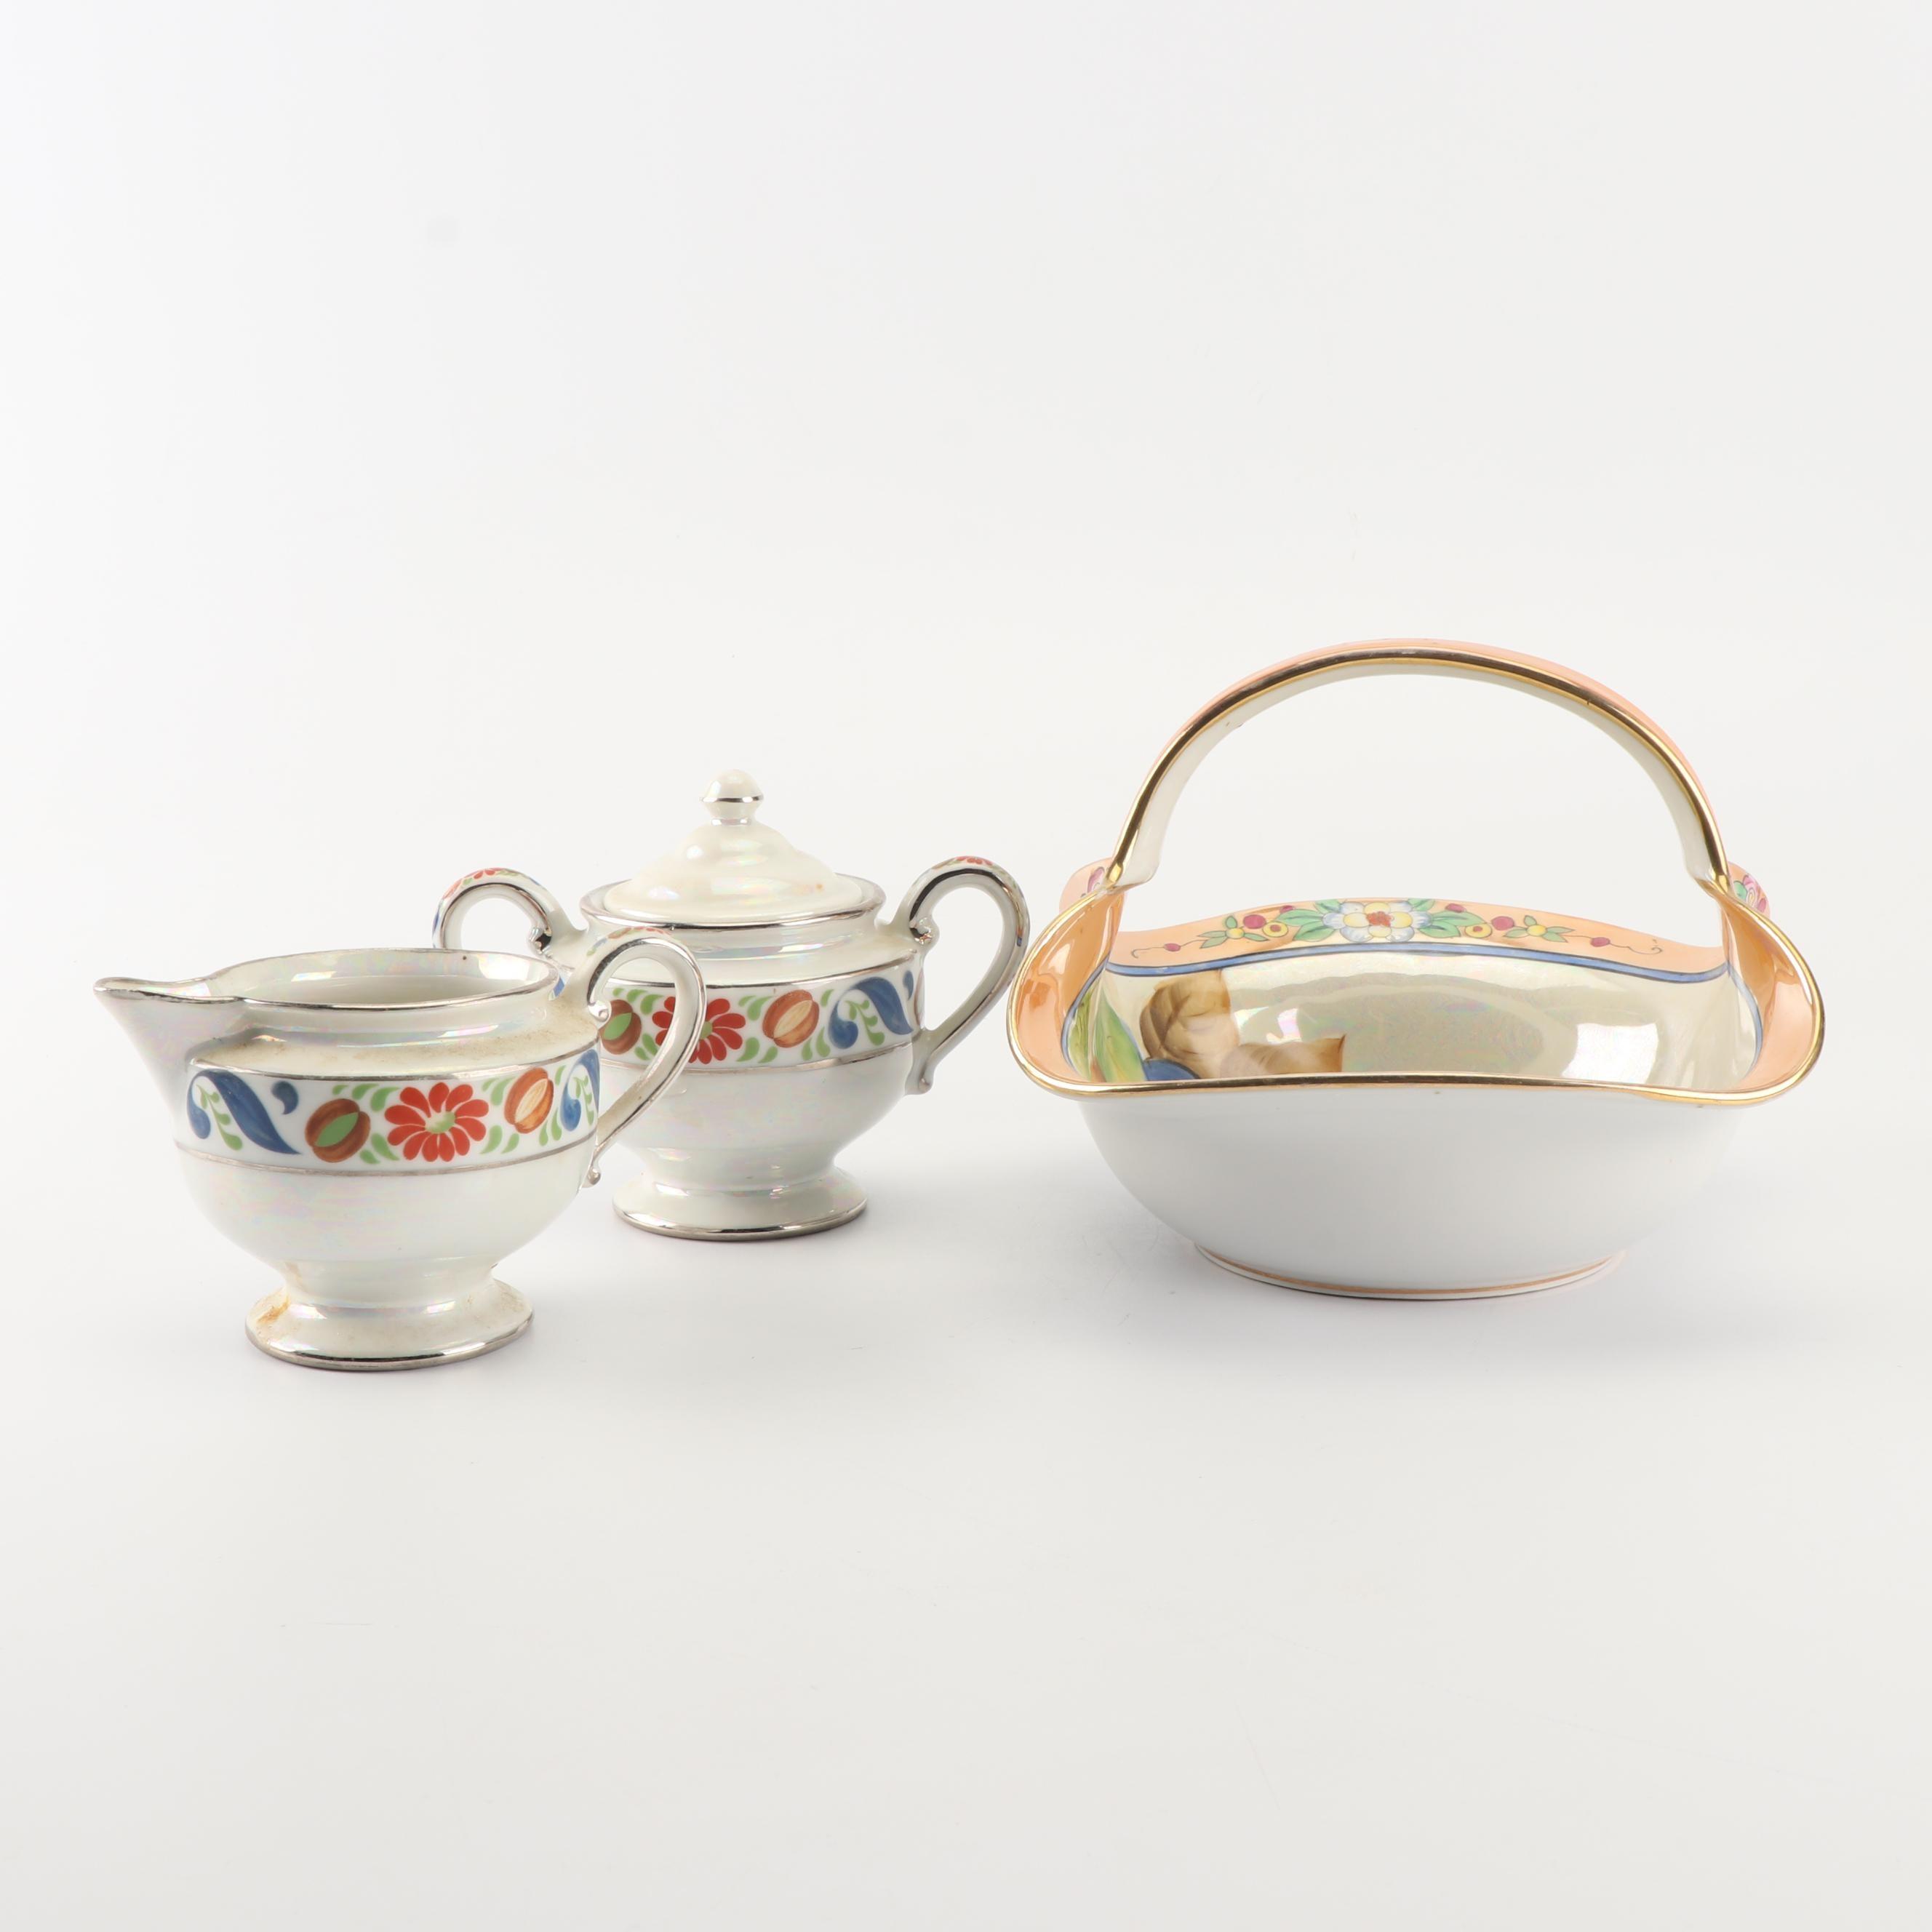 Vintage Lusterware Porcelain Including Hand-Painted Japanese Basket